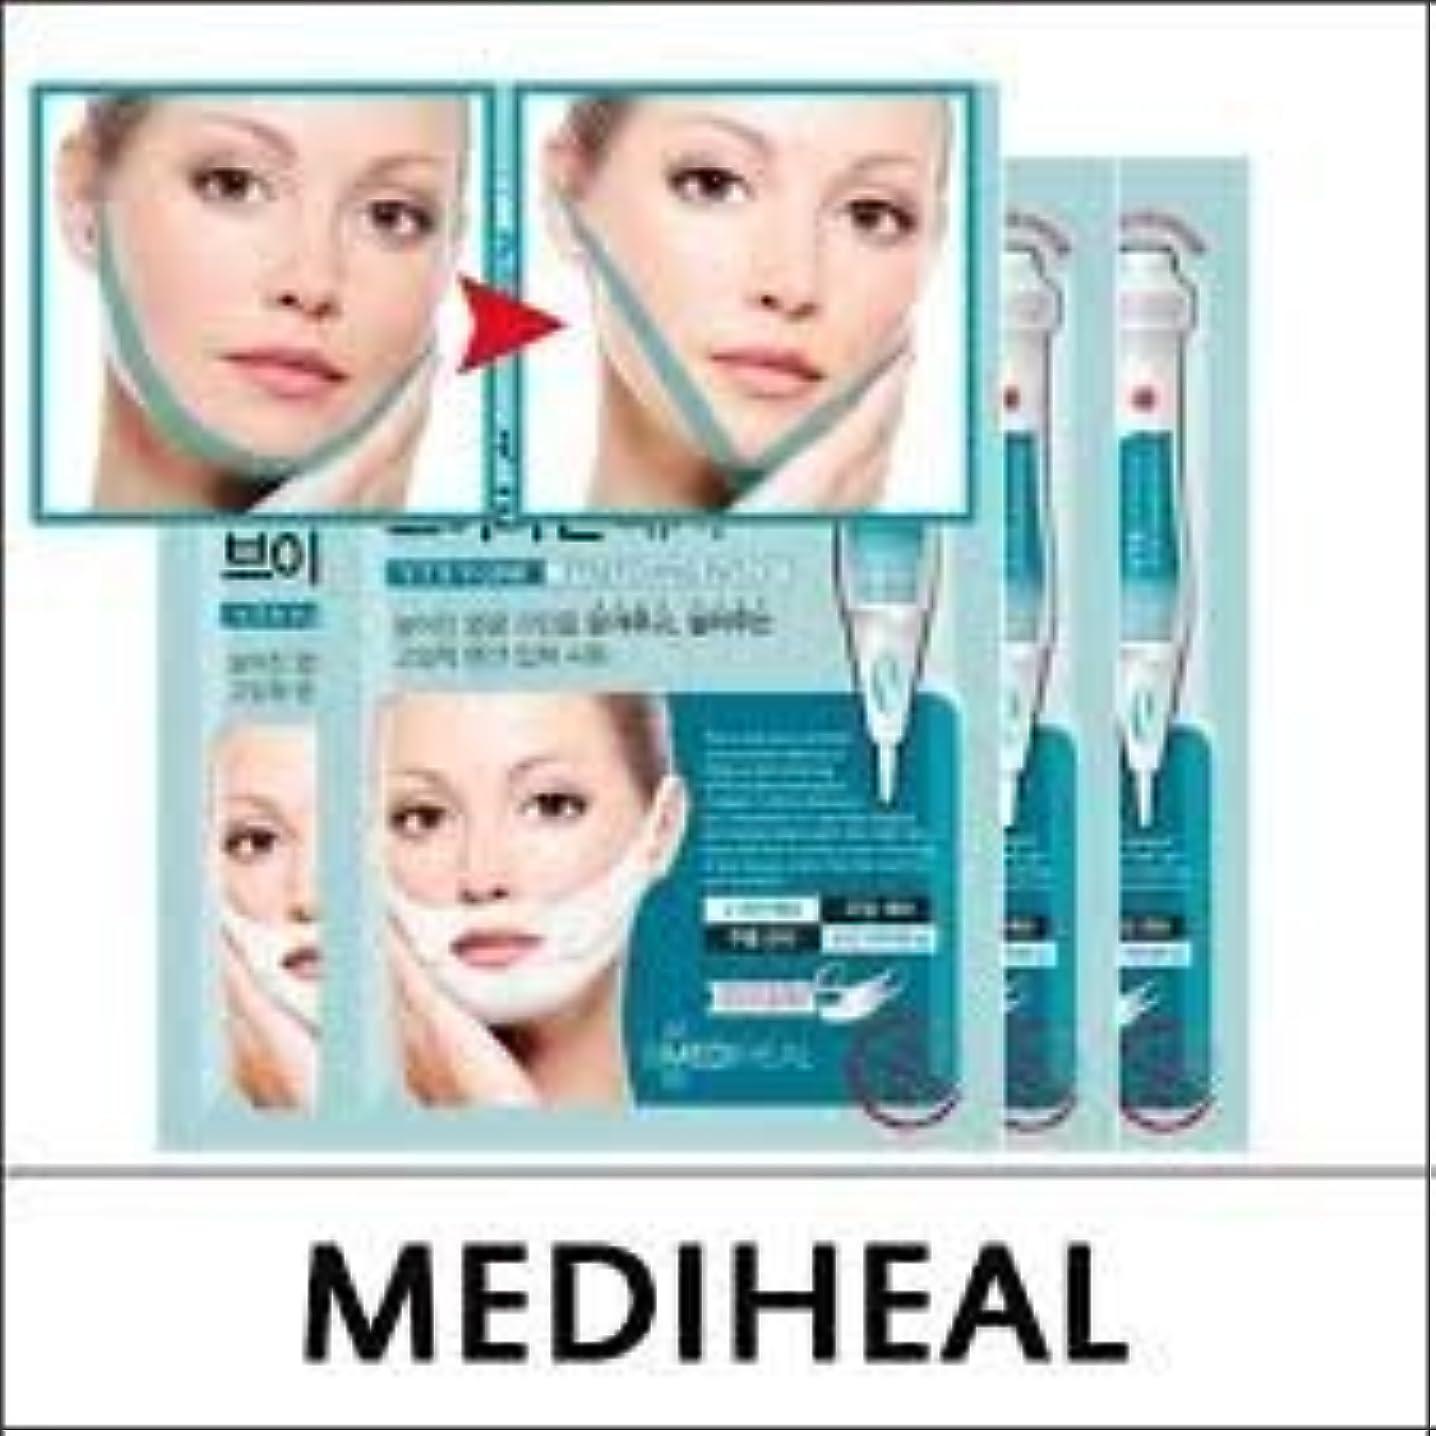 円形経済セメントMEDIHEAL VTR V Stretching Patch 20mlX4pcs/A.R.P Neck Patch/100% Authentic Korea Cosmetic (VTR V-Line Stretching Patch) [並行輸入品]